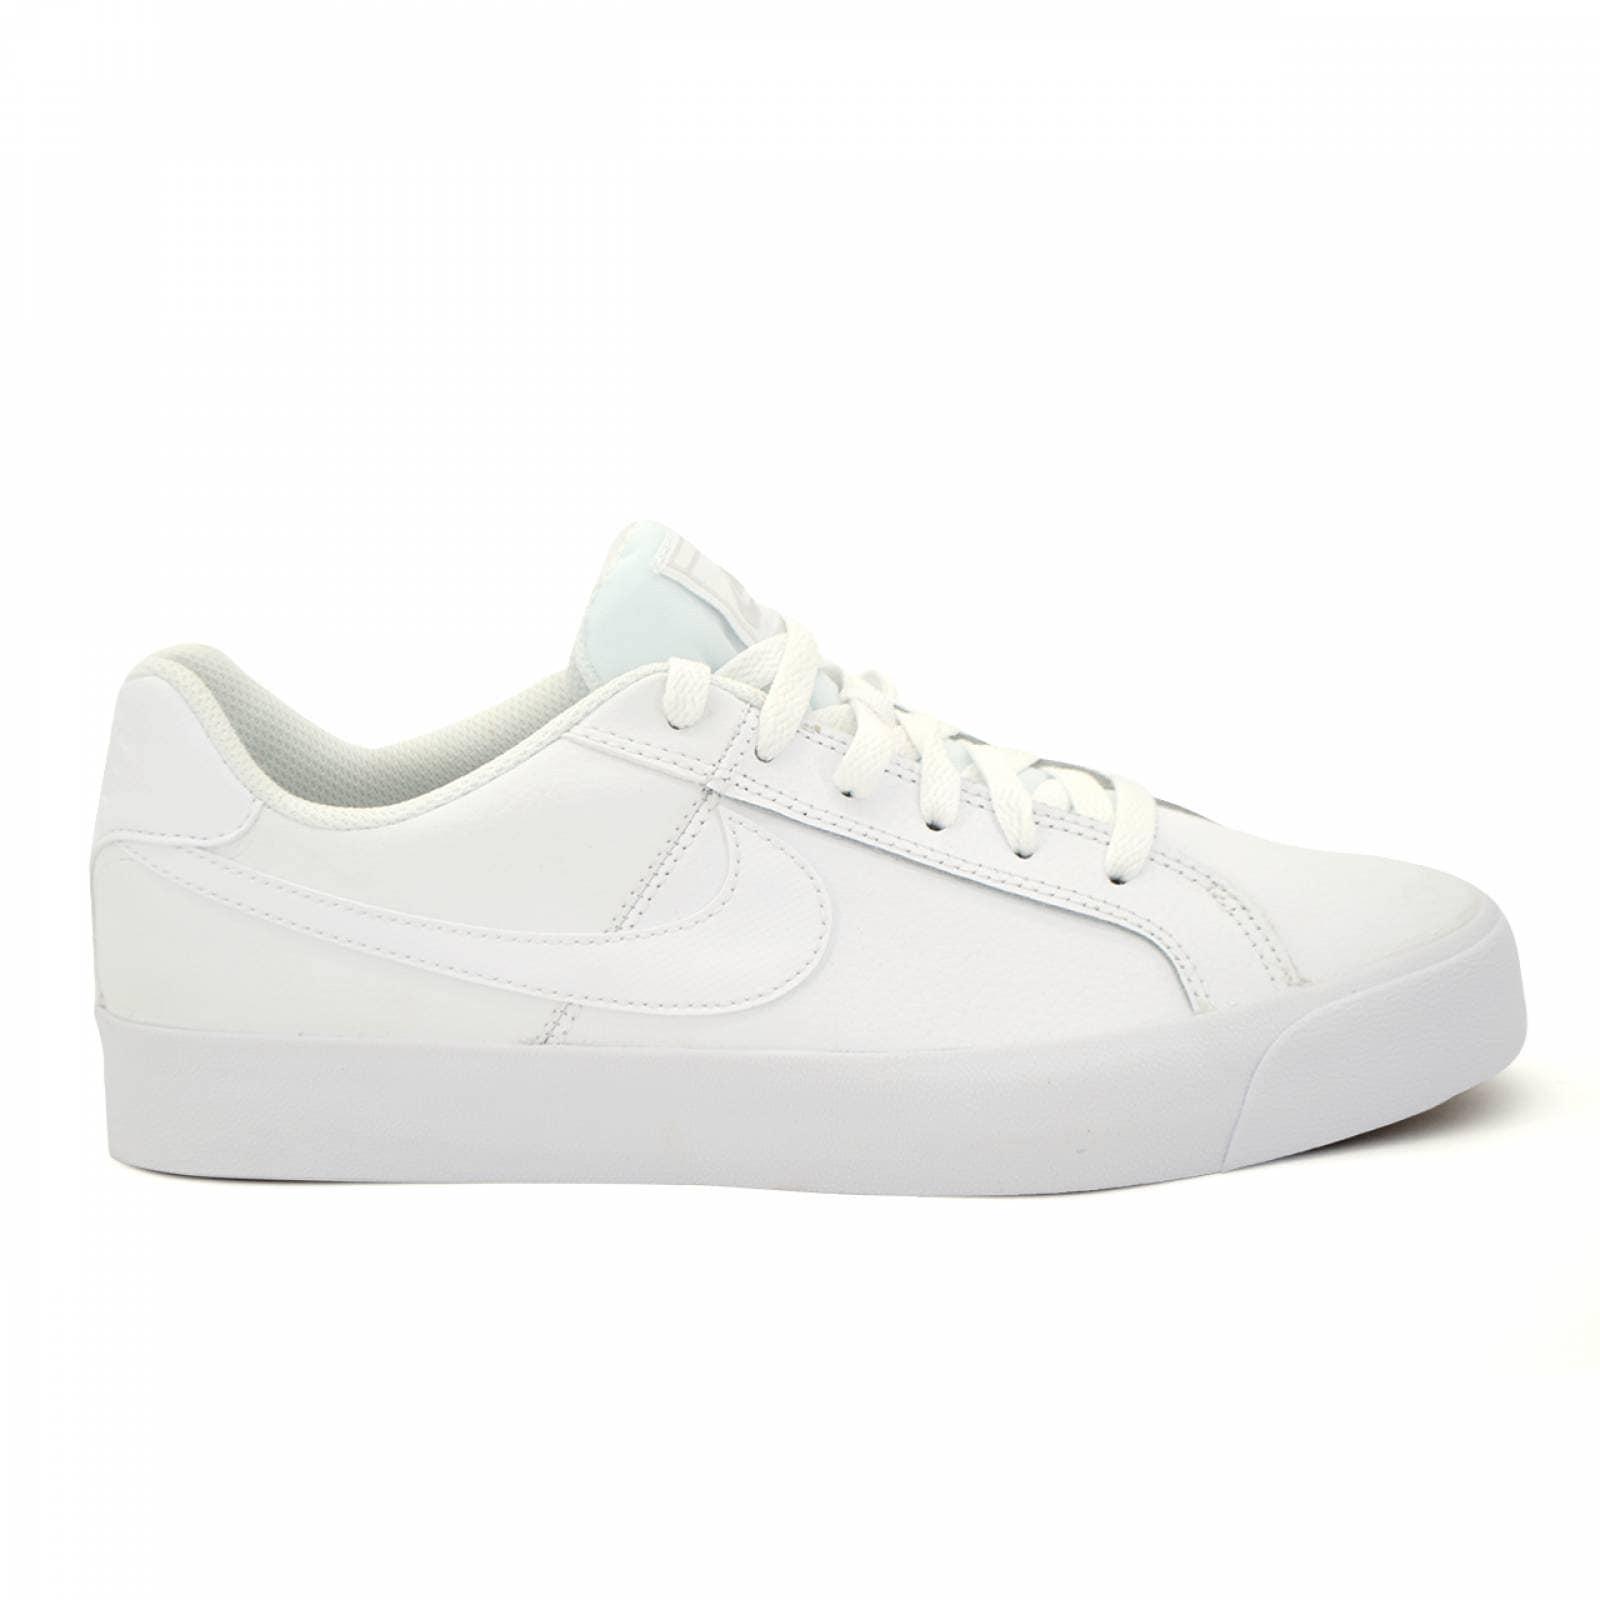 Tenis Nike para Hombre BQ4222 101 Blanco NIK2022